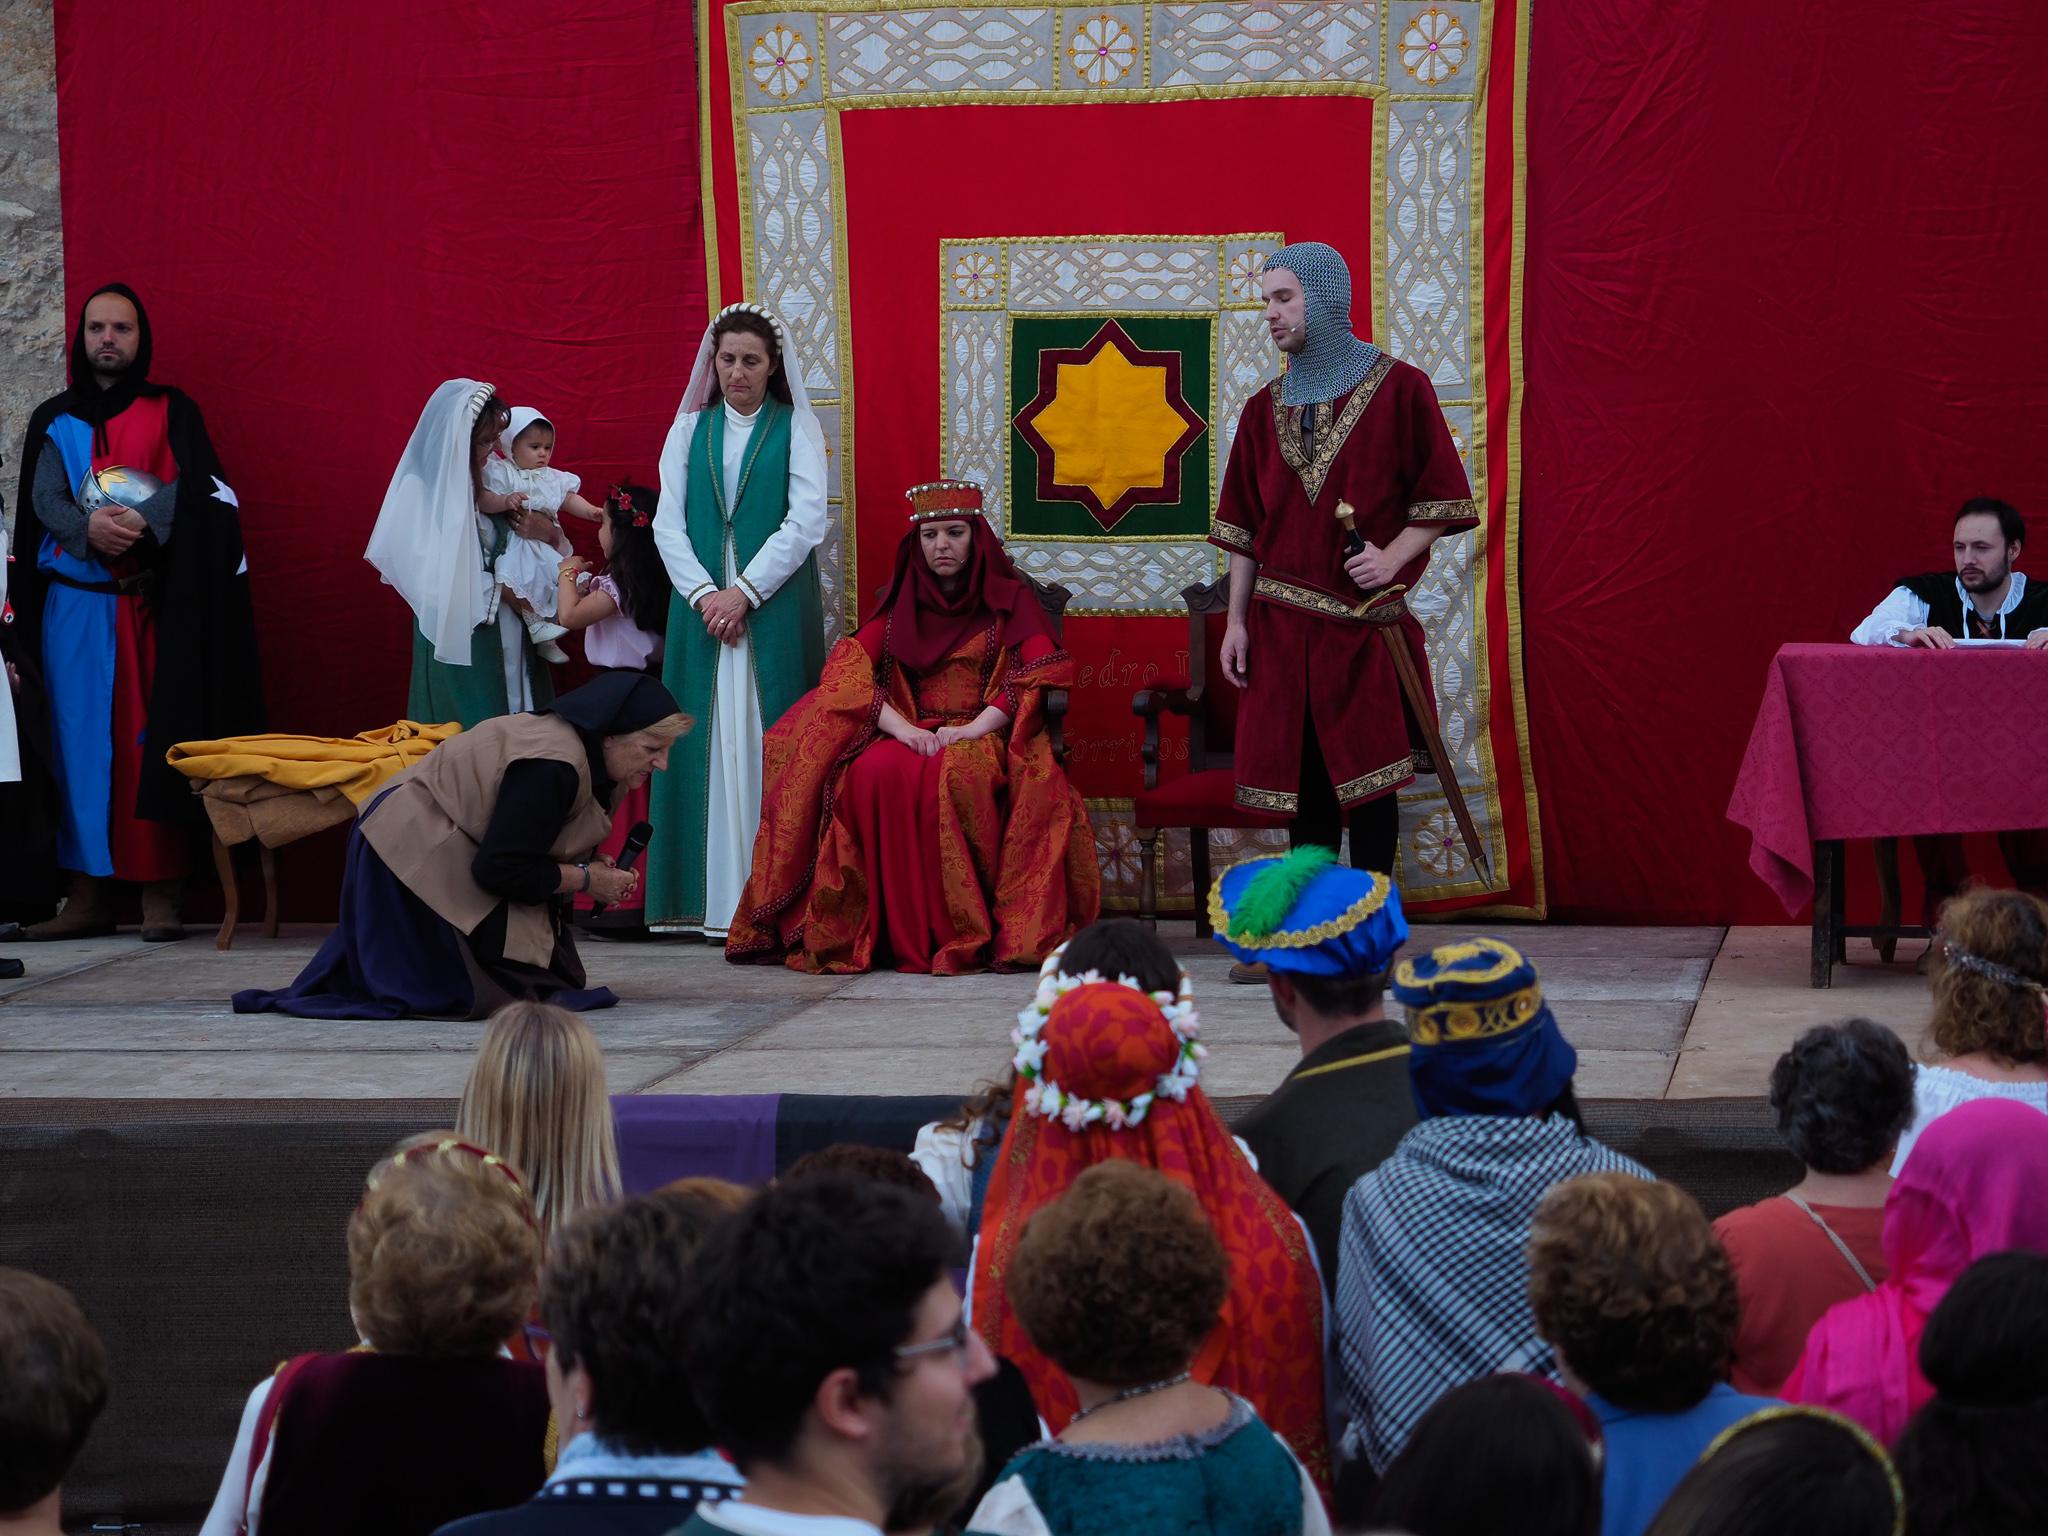 Representación histórica fiesta medieval